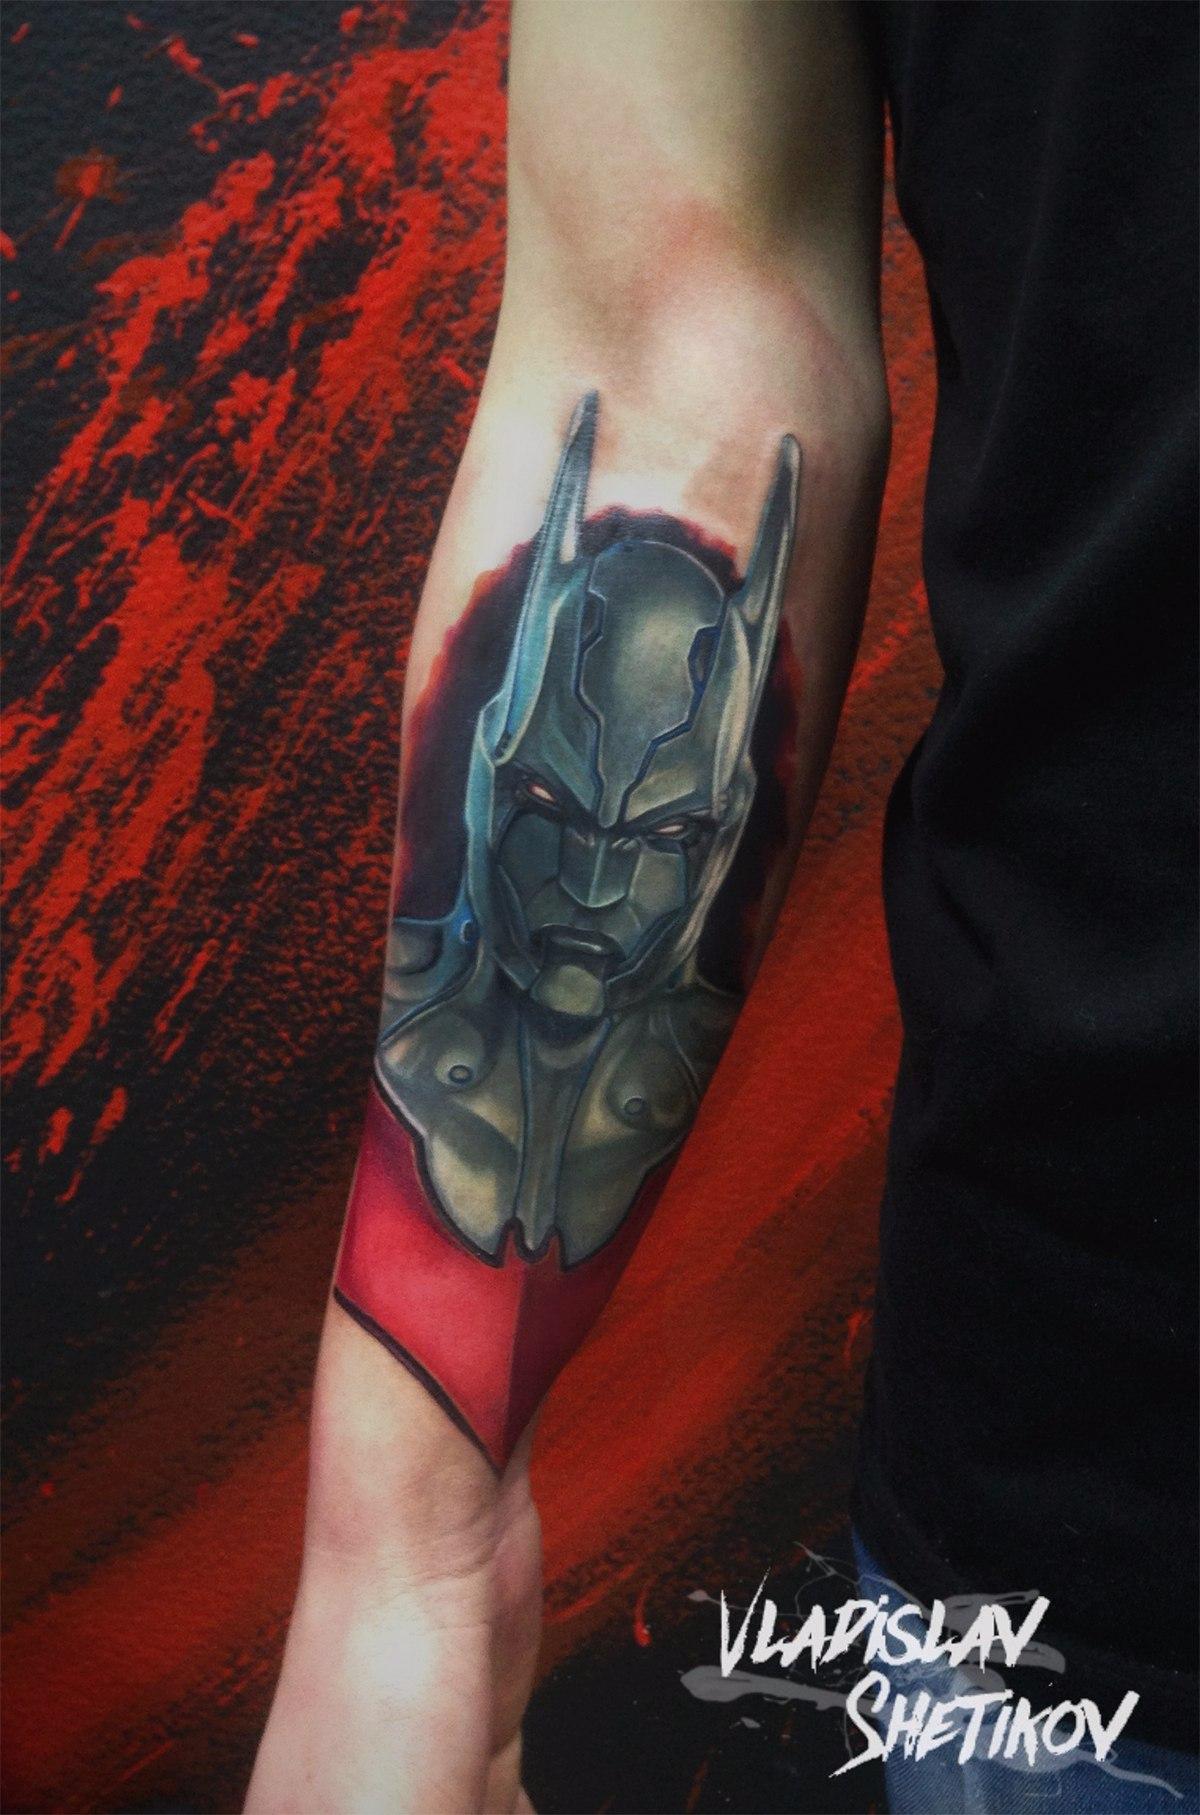 Batman head tattoo on forearm